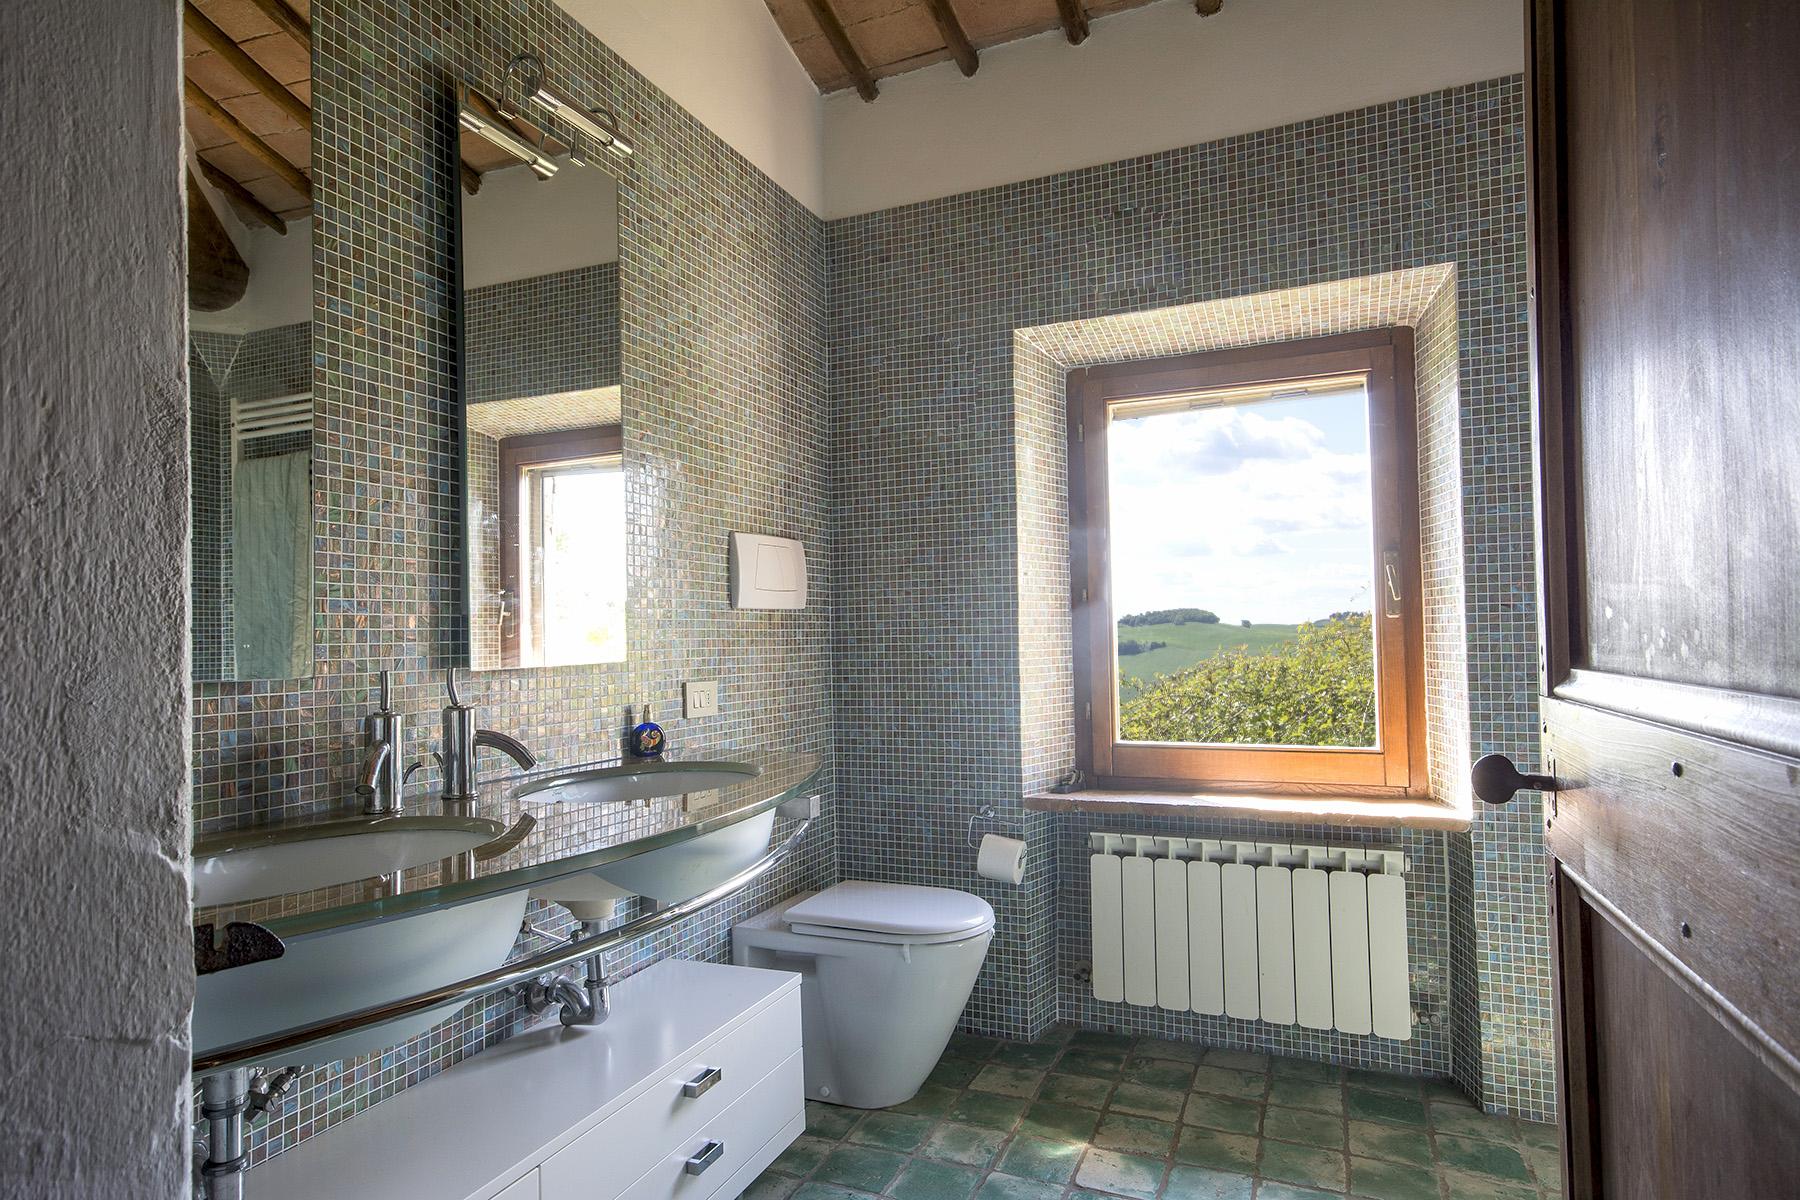 Casa indipendente in Vendita a Pienza: 5 locali, 400 mq - Foto 17